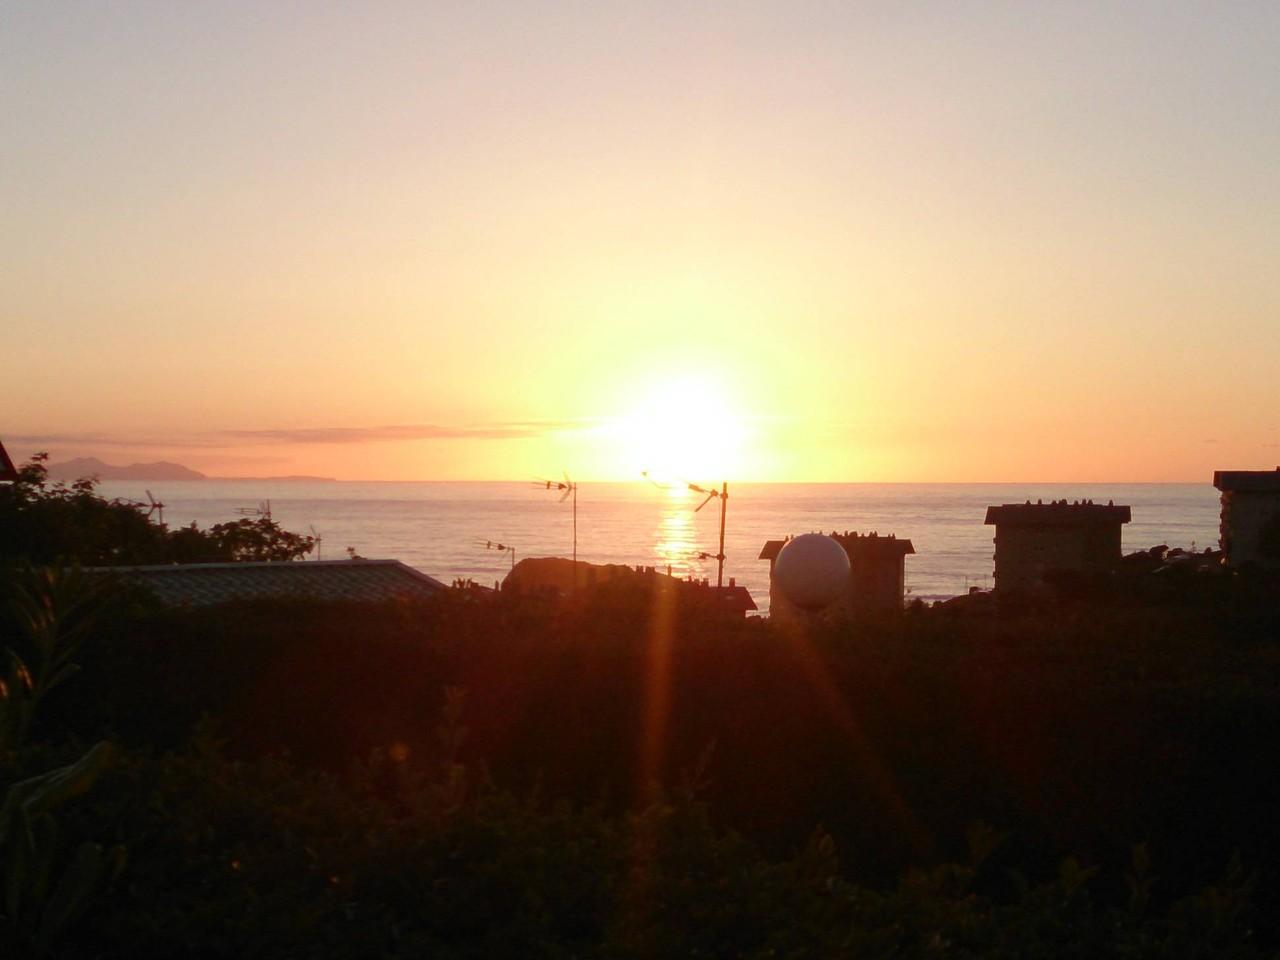 Sospelana - 1° coucher de soleil